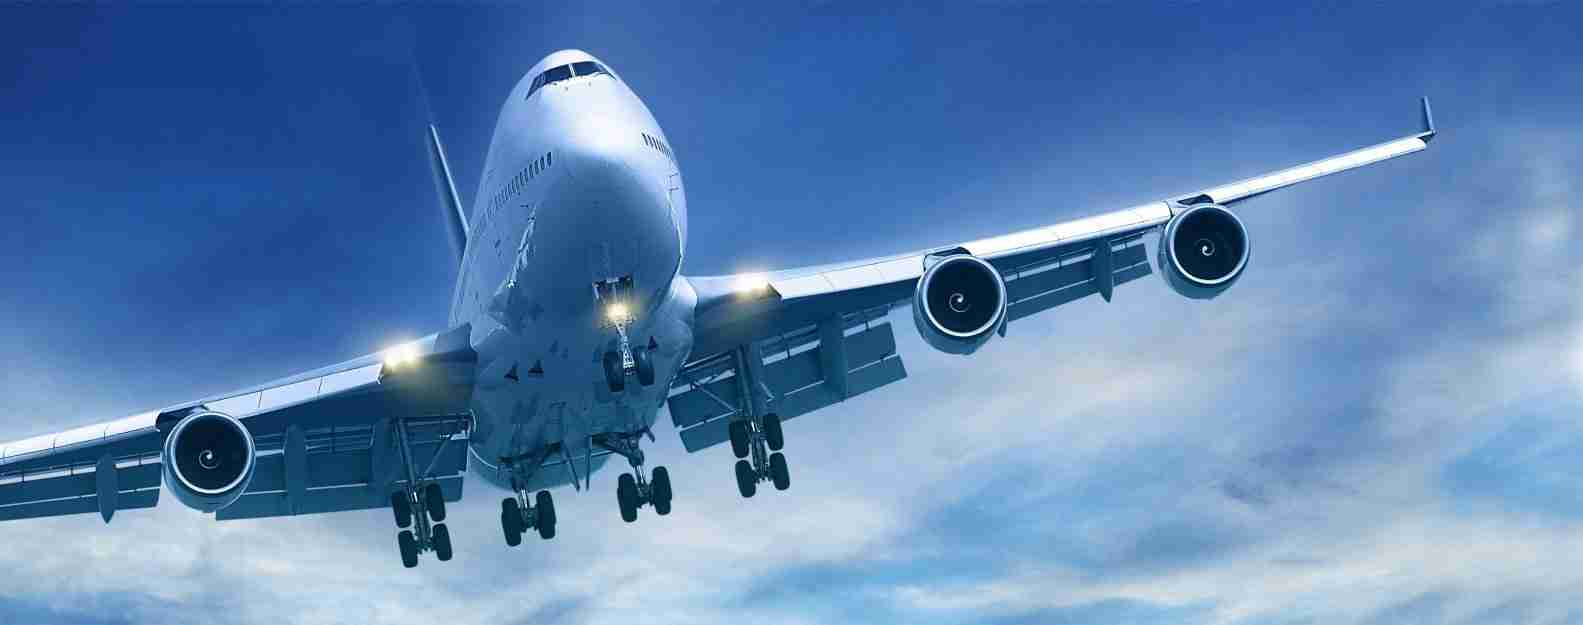 Авиаперевозки в Ишимбай